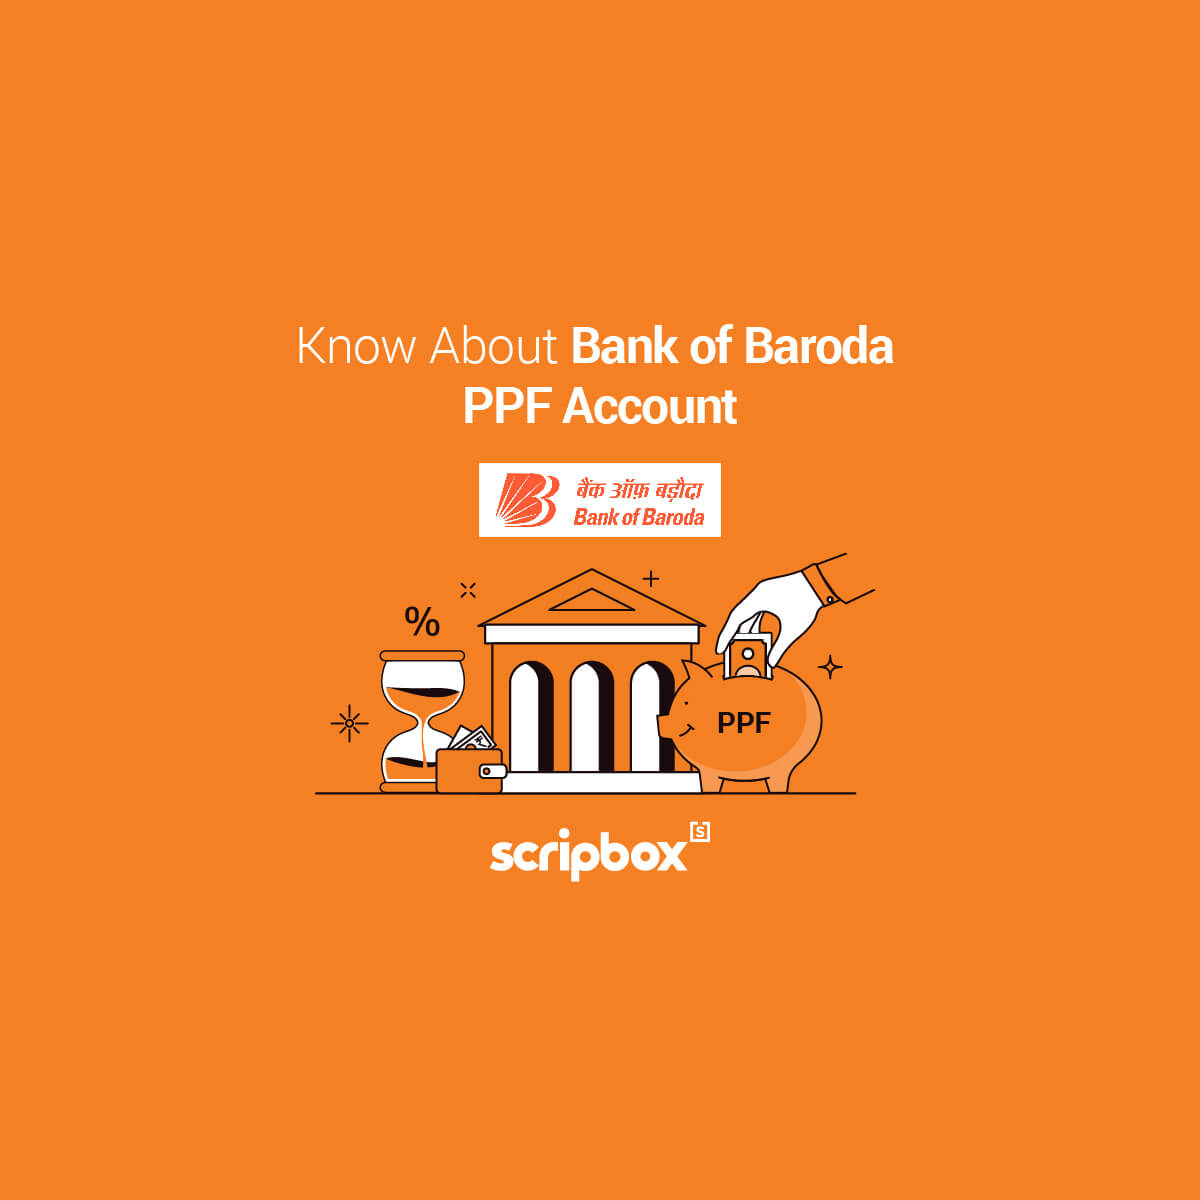 bank of baroda ppf account